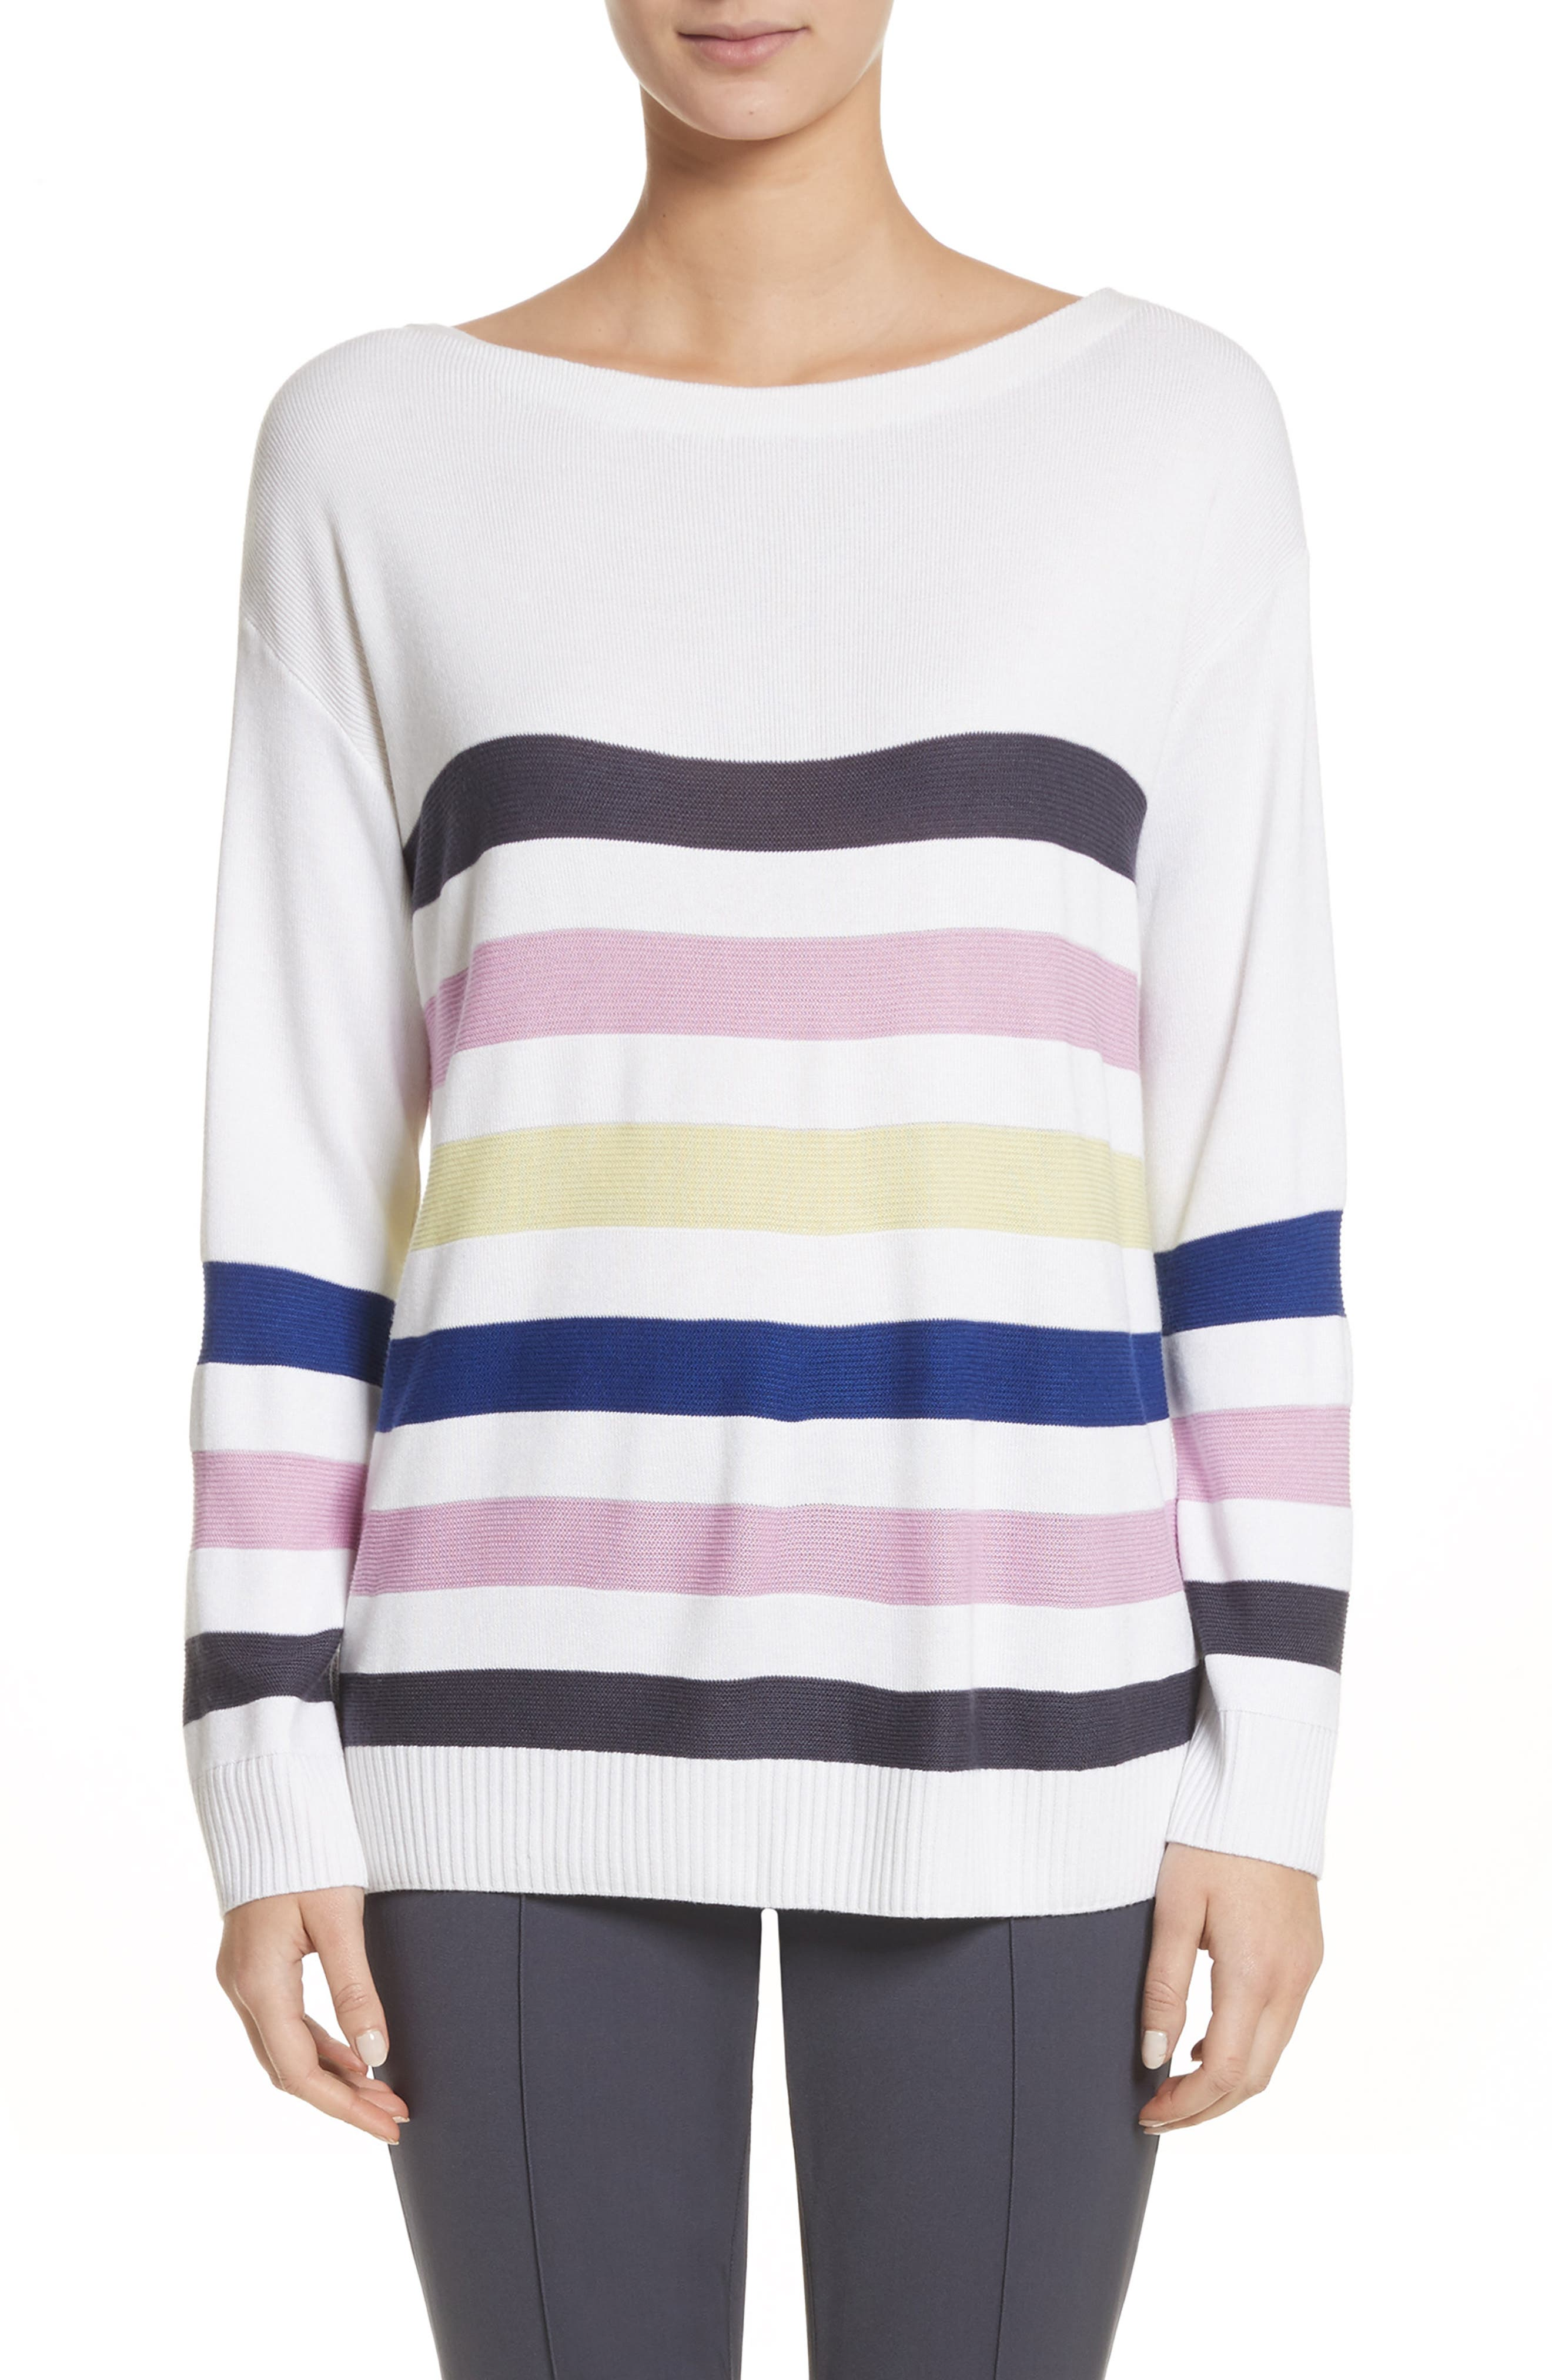 Links Stripe Knit Sweater,                         Main,                         color, 100